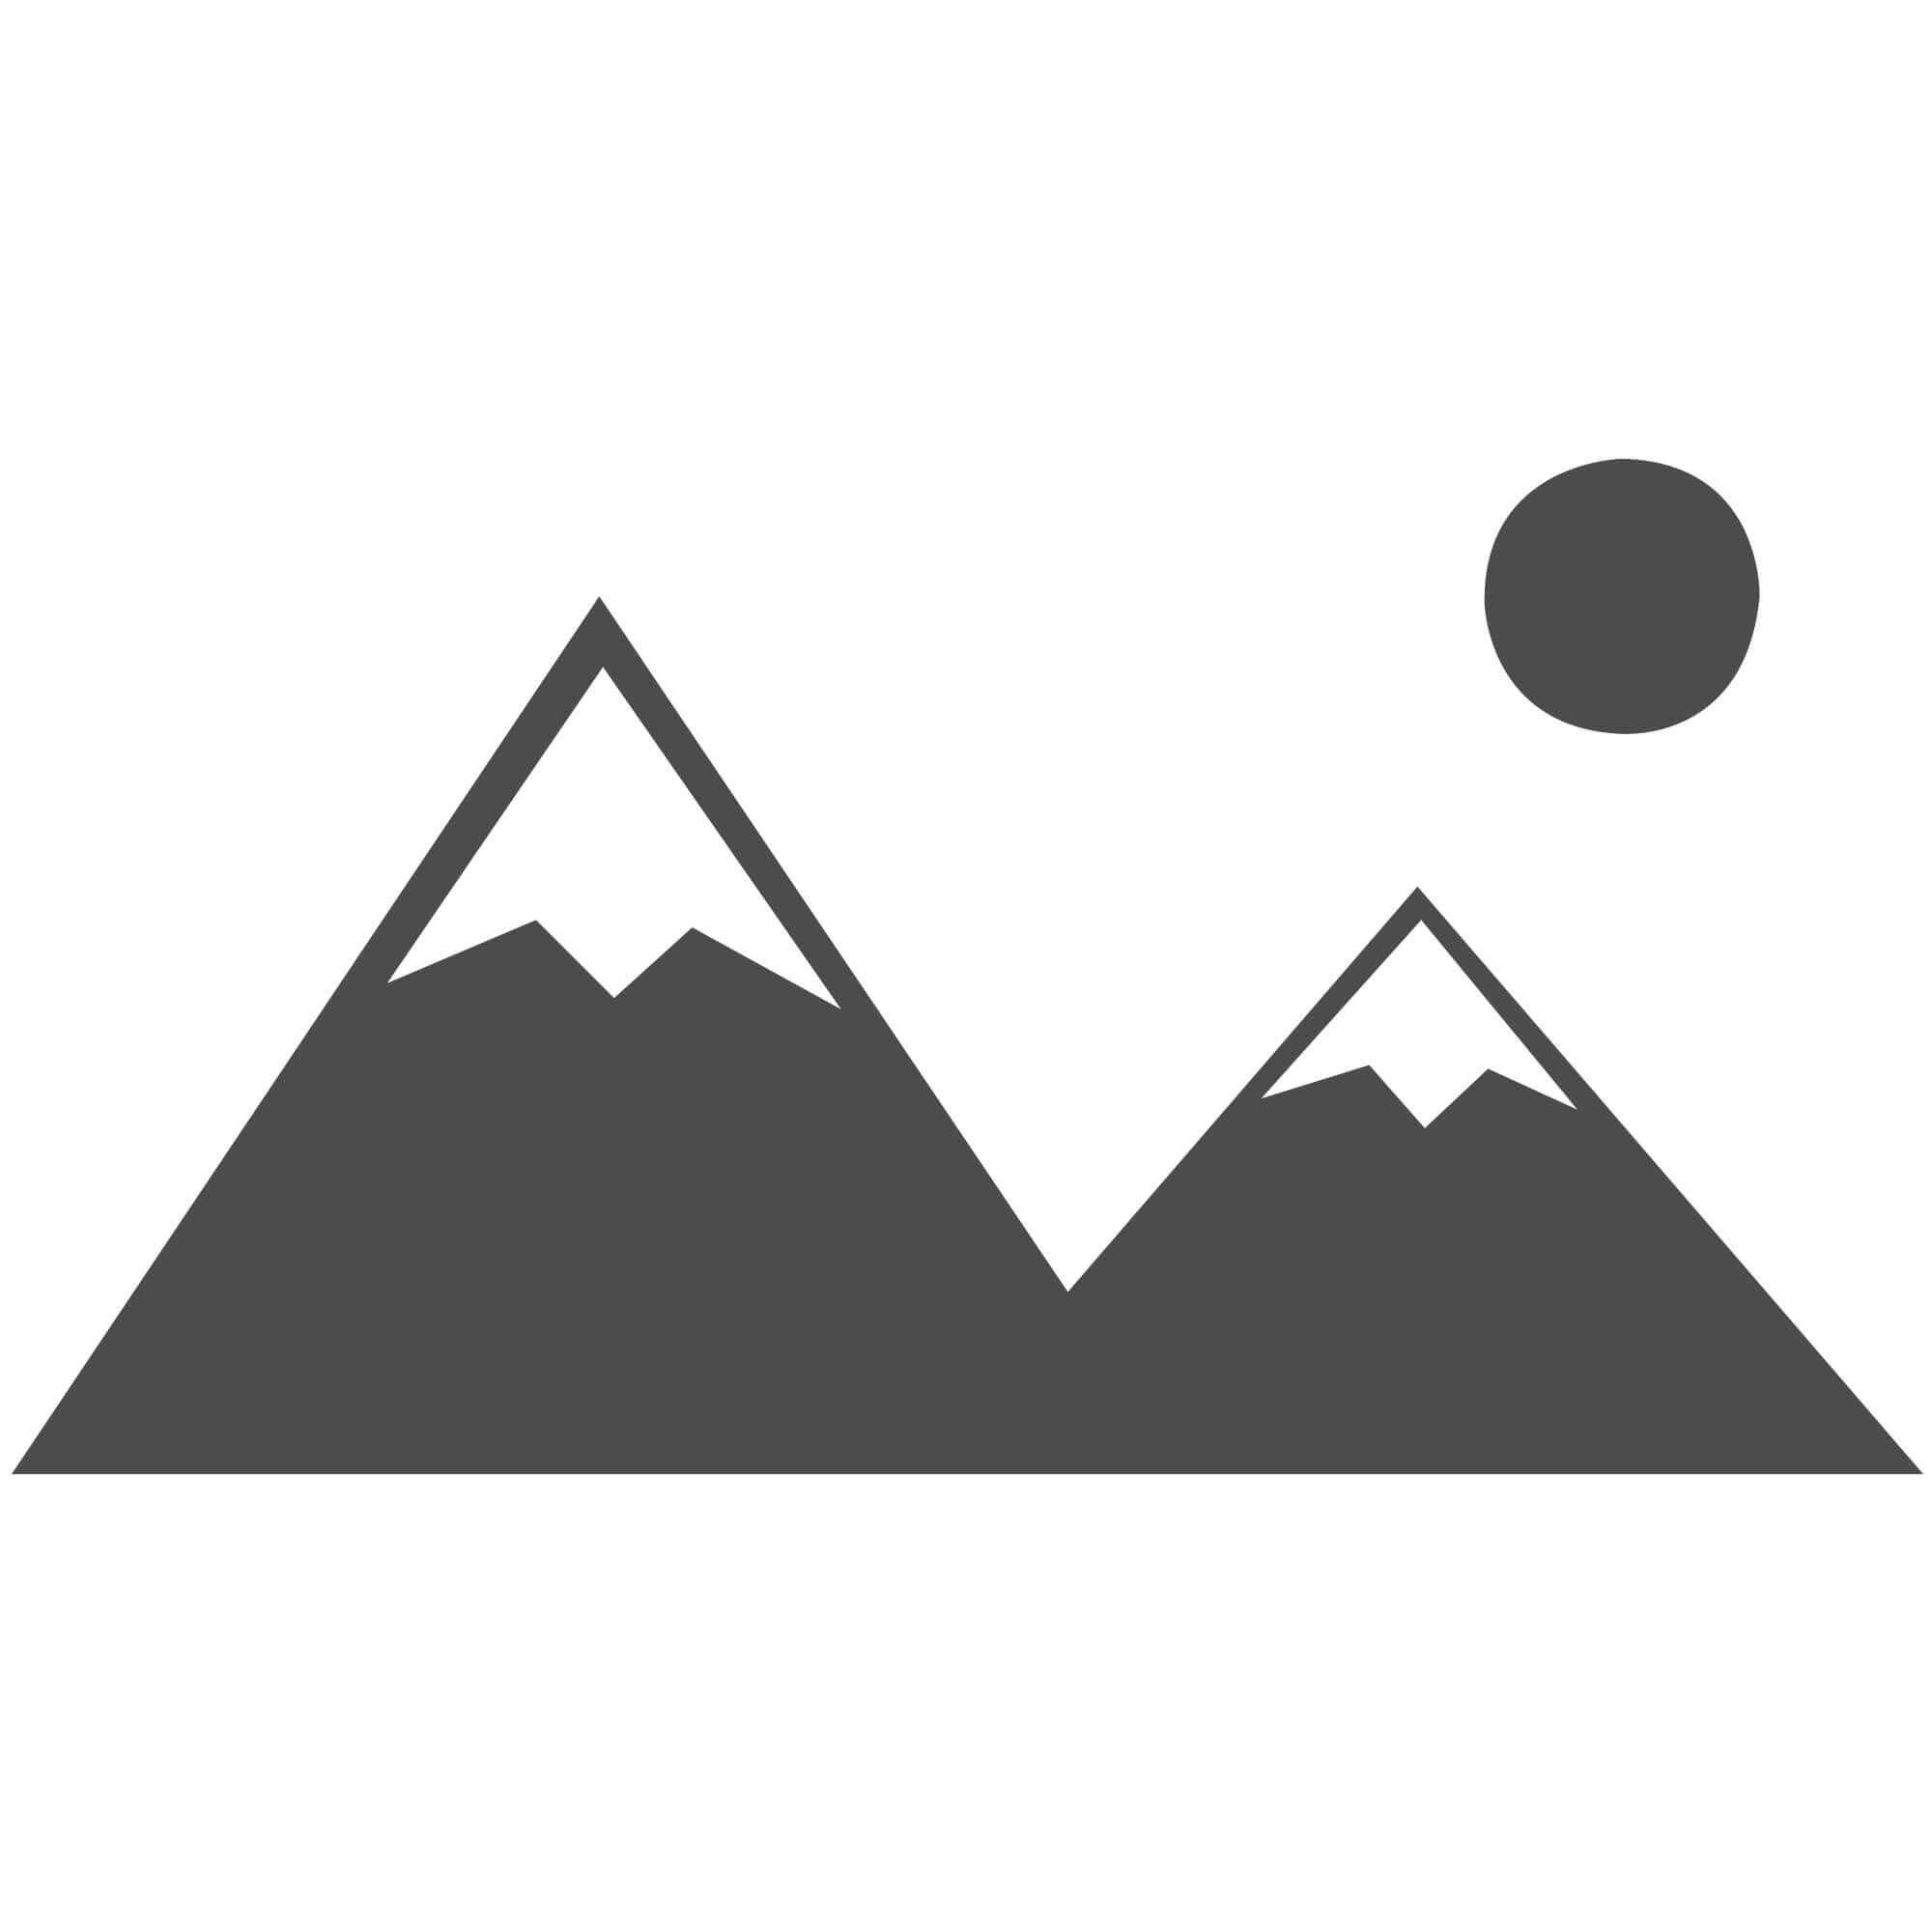 "Velvet Droplet Rug - Black Grey - Size 120 x 170 cm (4' x 5'7"")"